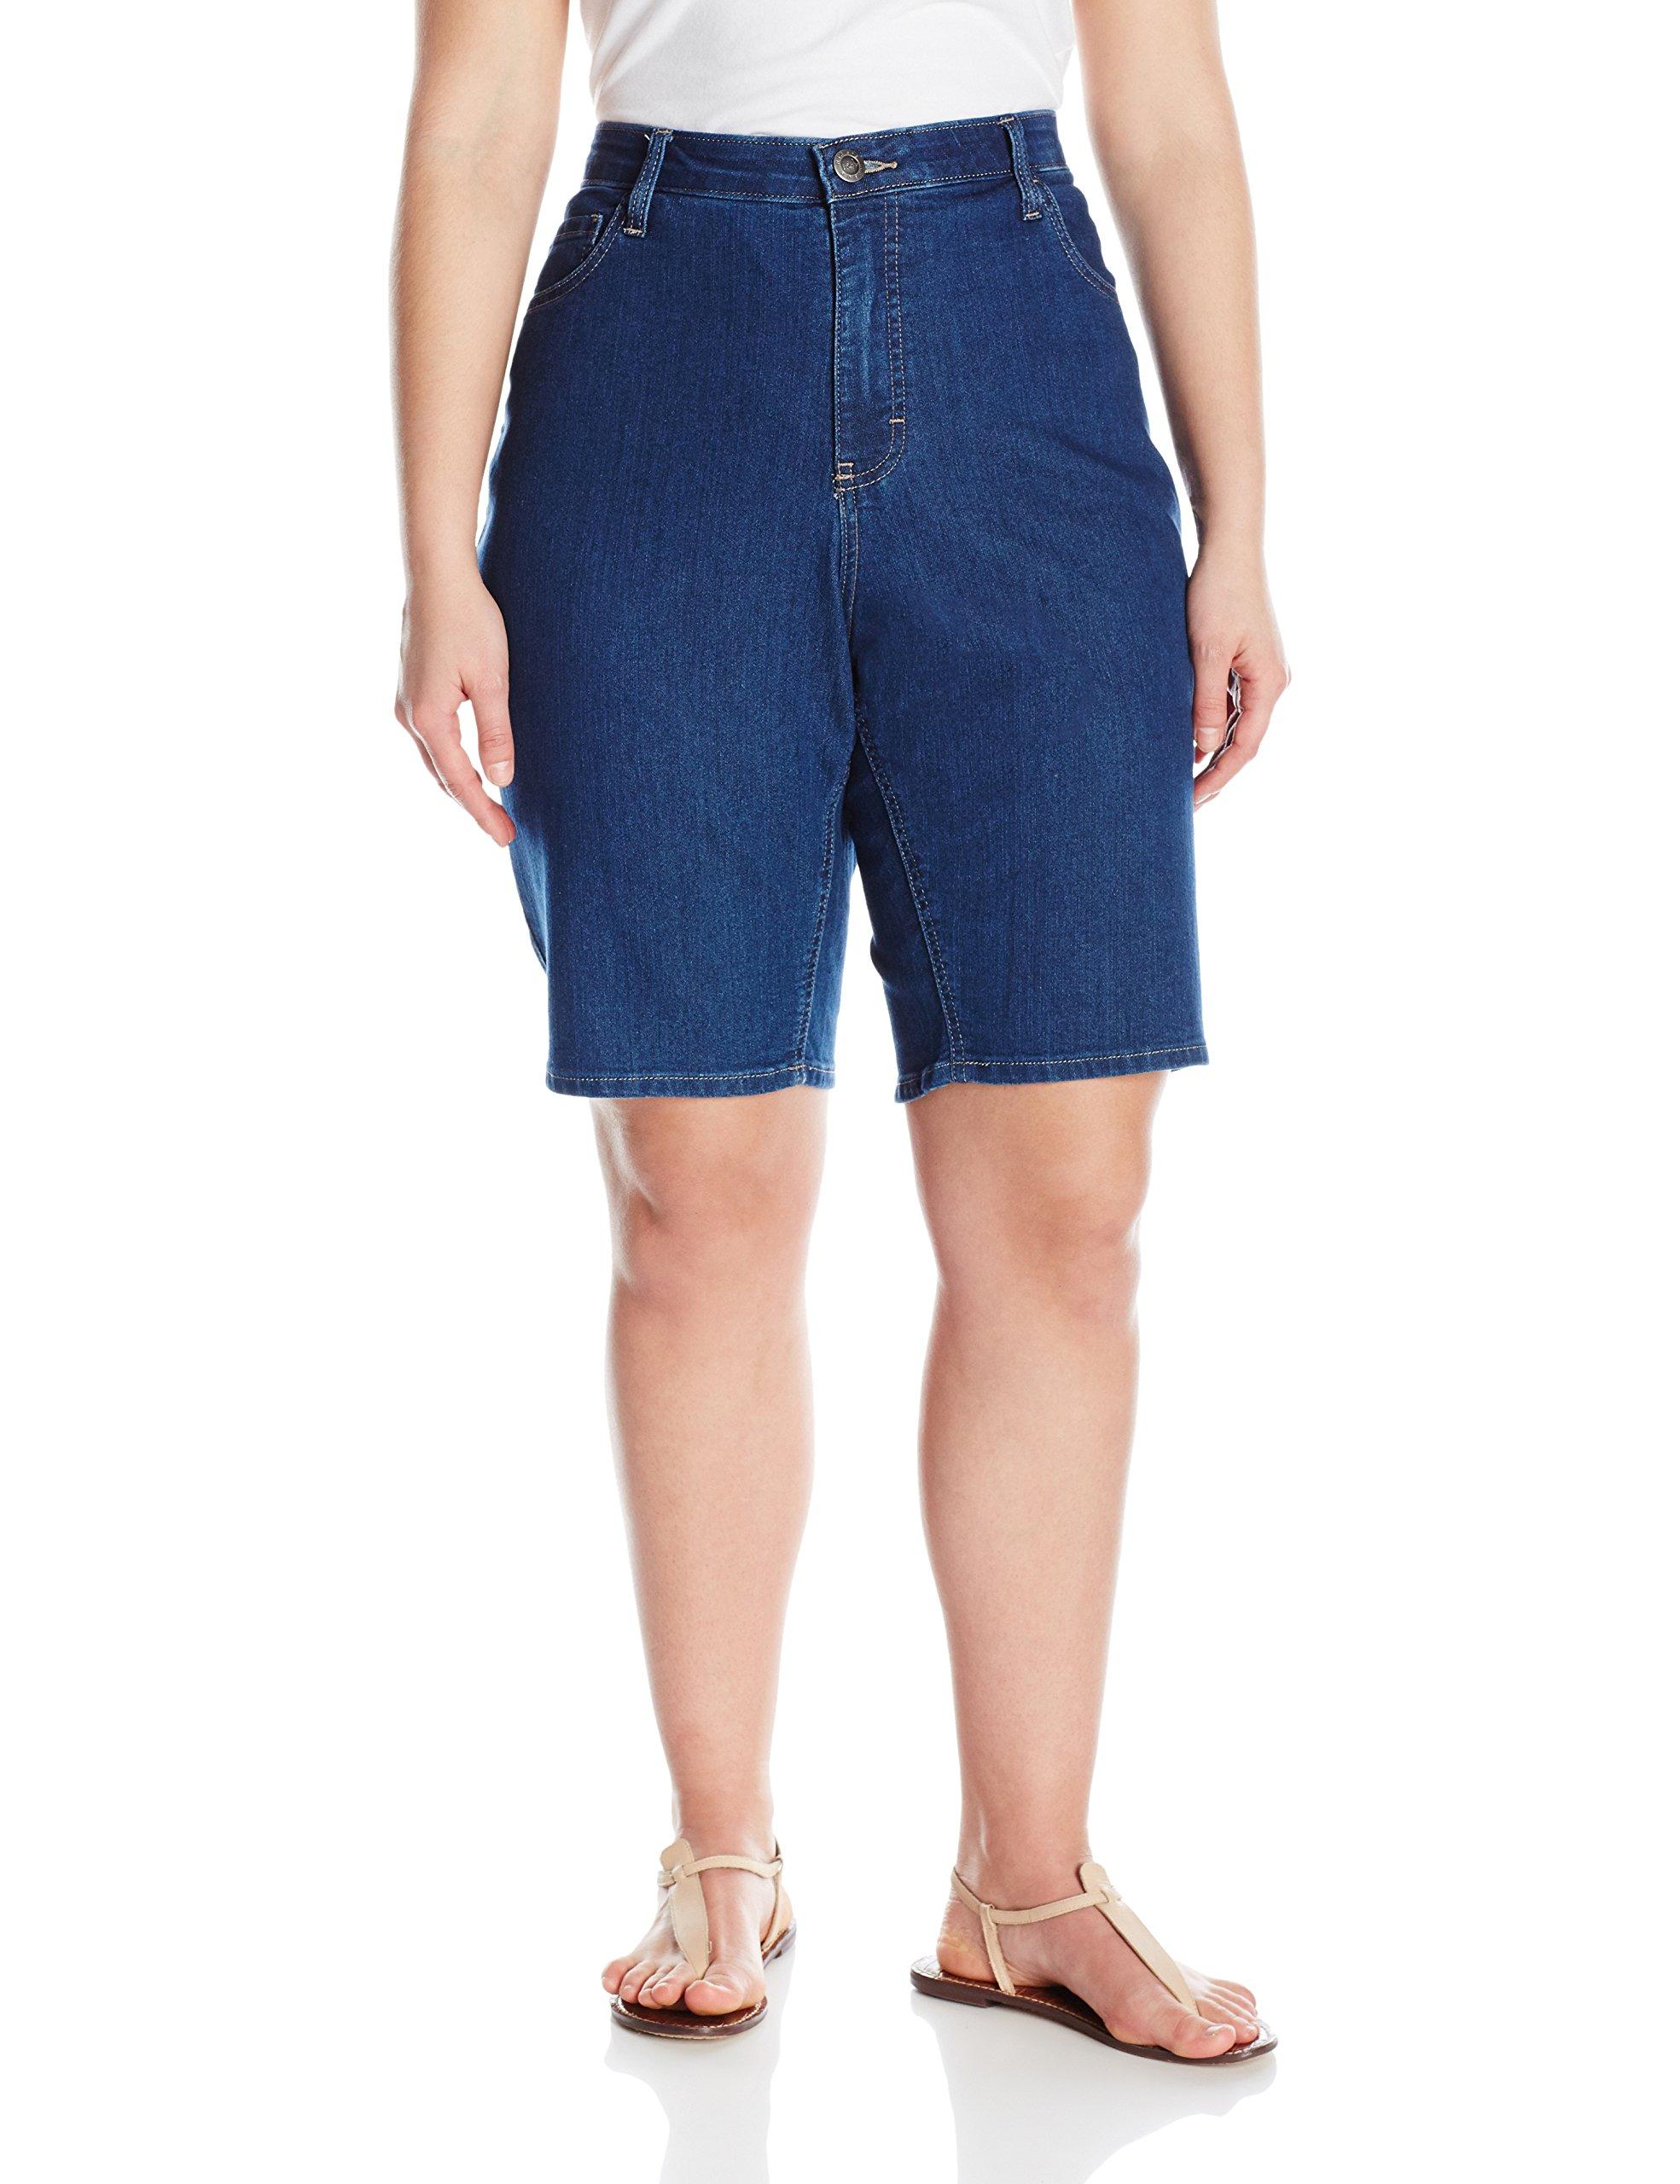 a559b9e711 Riders by Lee Indigo Women s Plus-Size Comfort Waist Bermuda Short